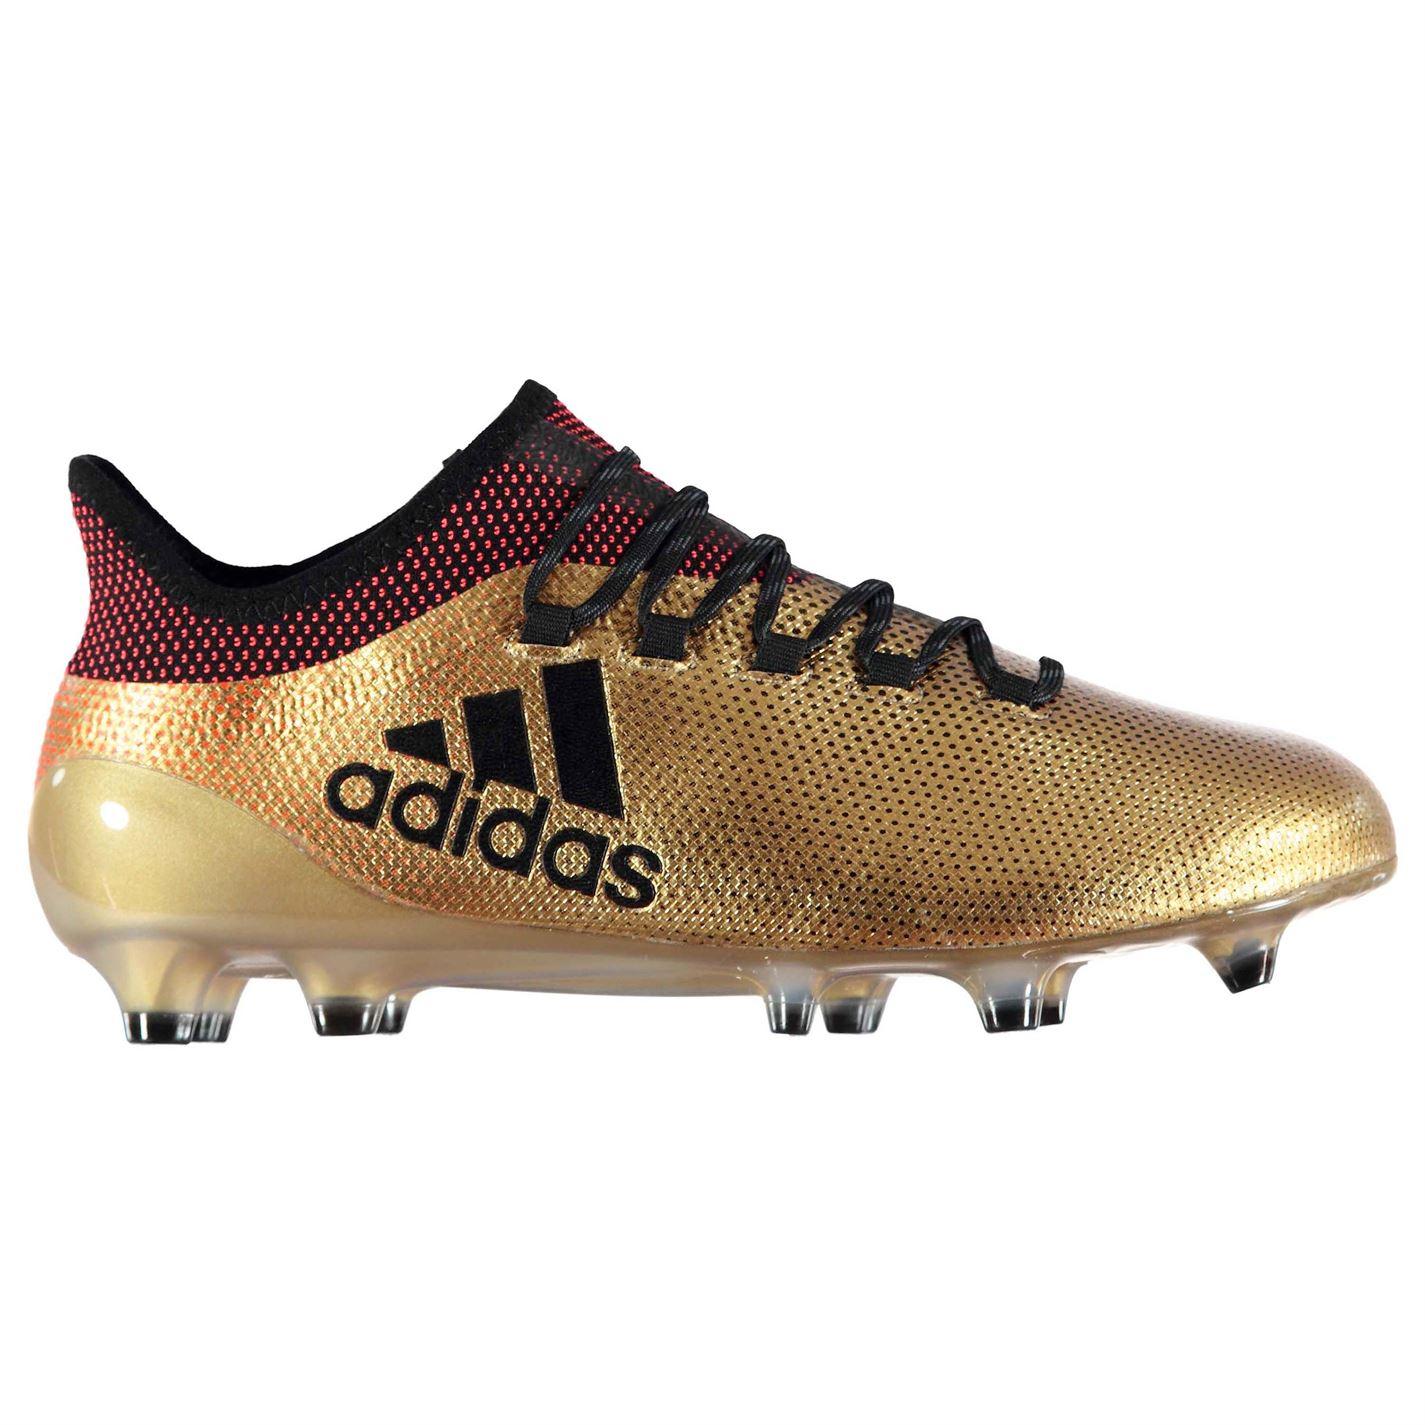 Adidas X 17.1 FG Mens Football Boots